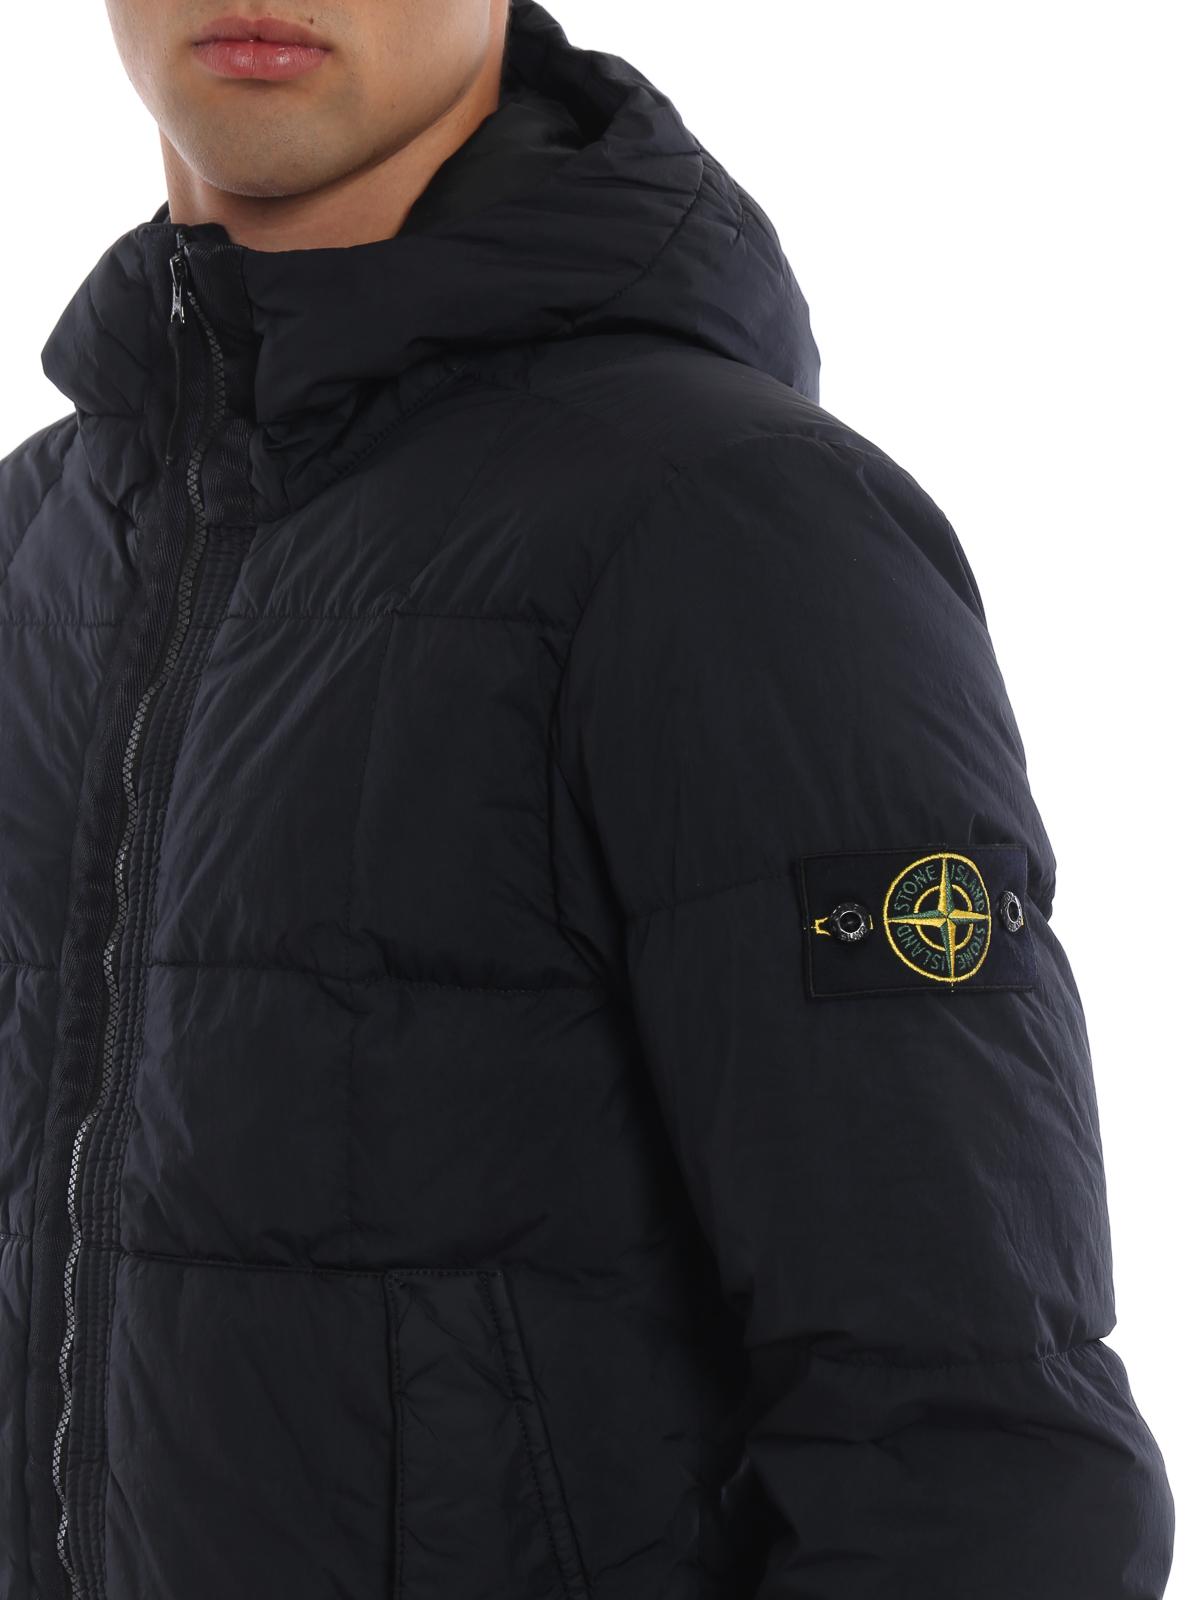 e75aba6ec Stone Island - Garment Dyed Crinkle Reps Ny Down blue jacket ...